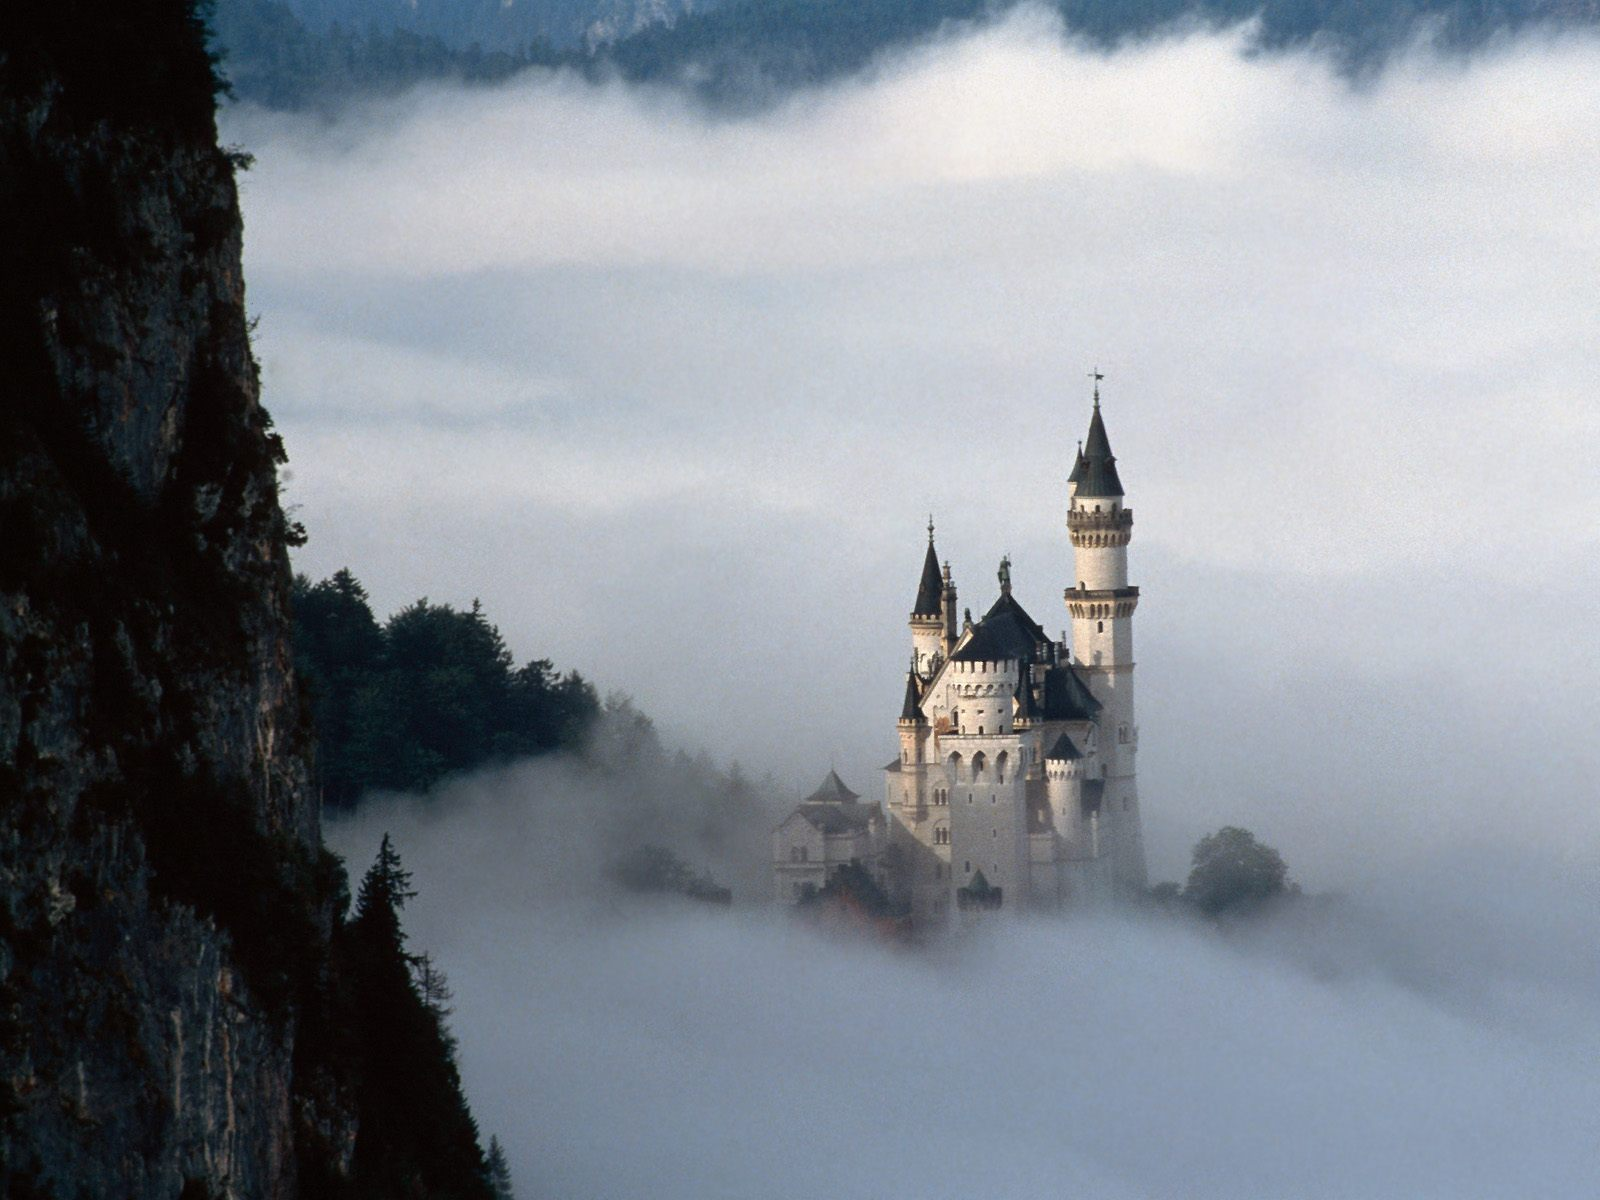 Castles of Arcadia